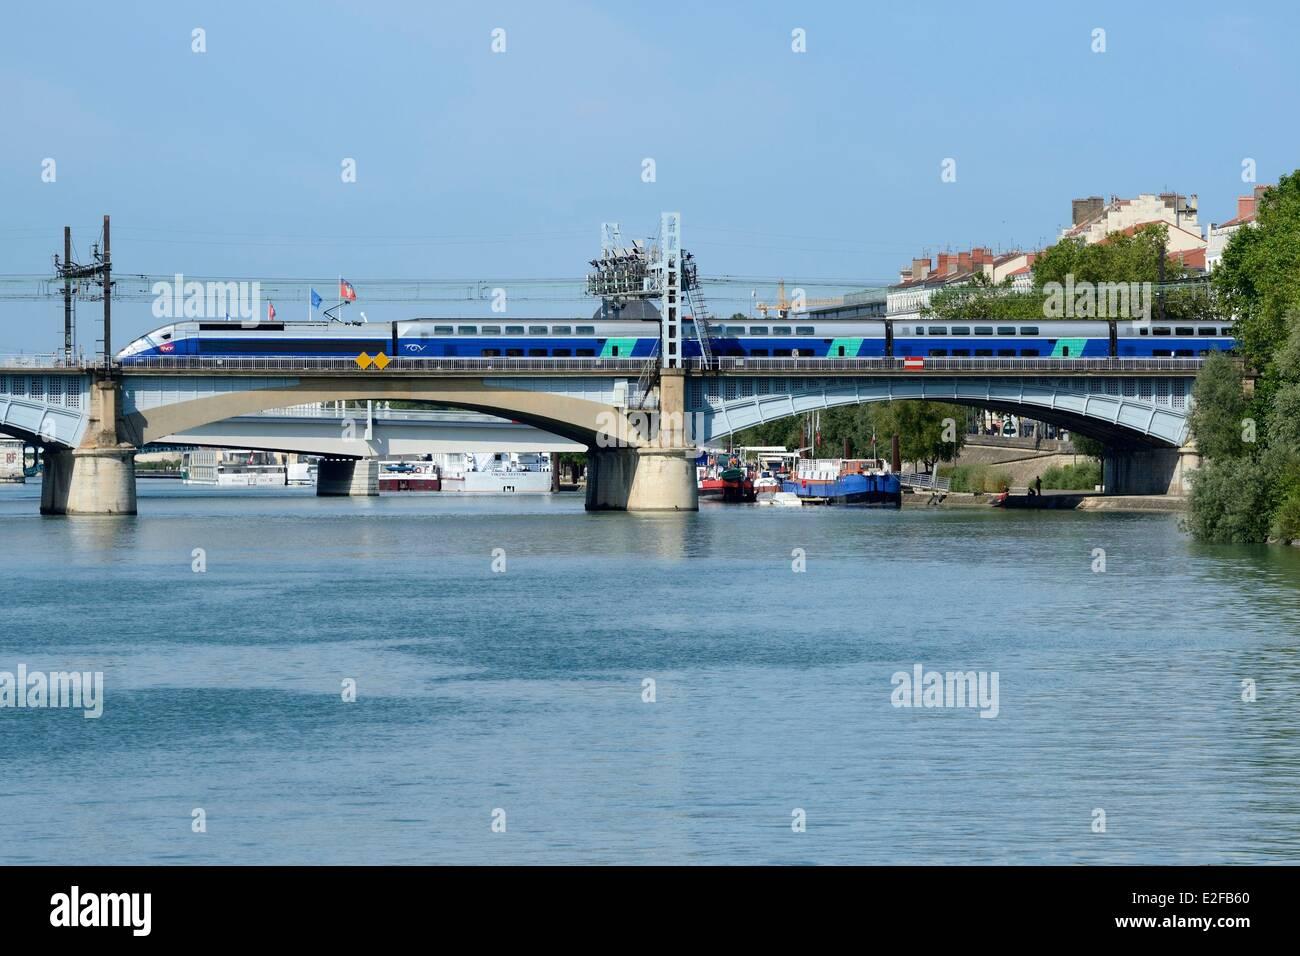 France, Rhone, Lyon, high speed train (TGV) crossing the Rhone near the Perrache station - Stock Image